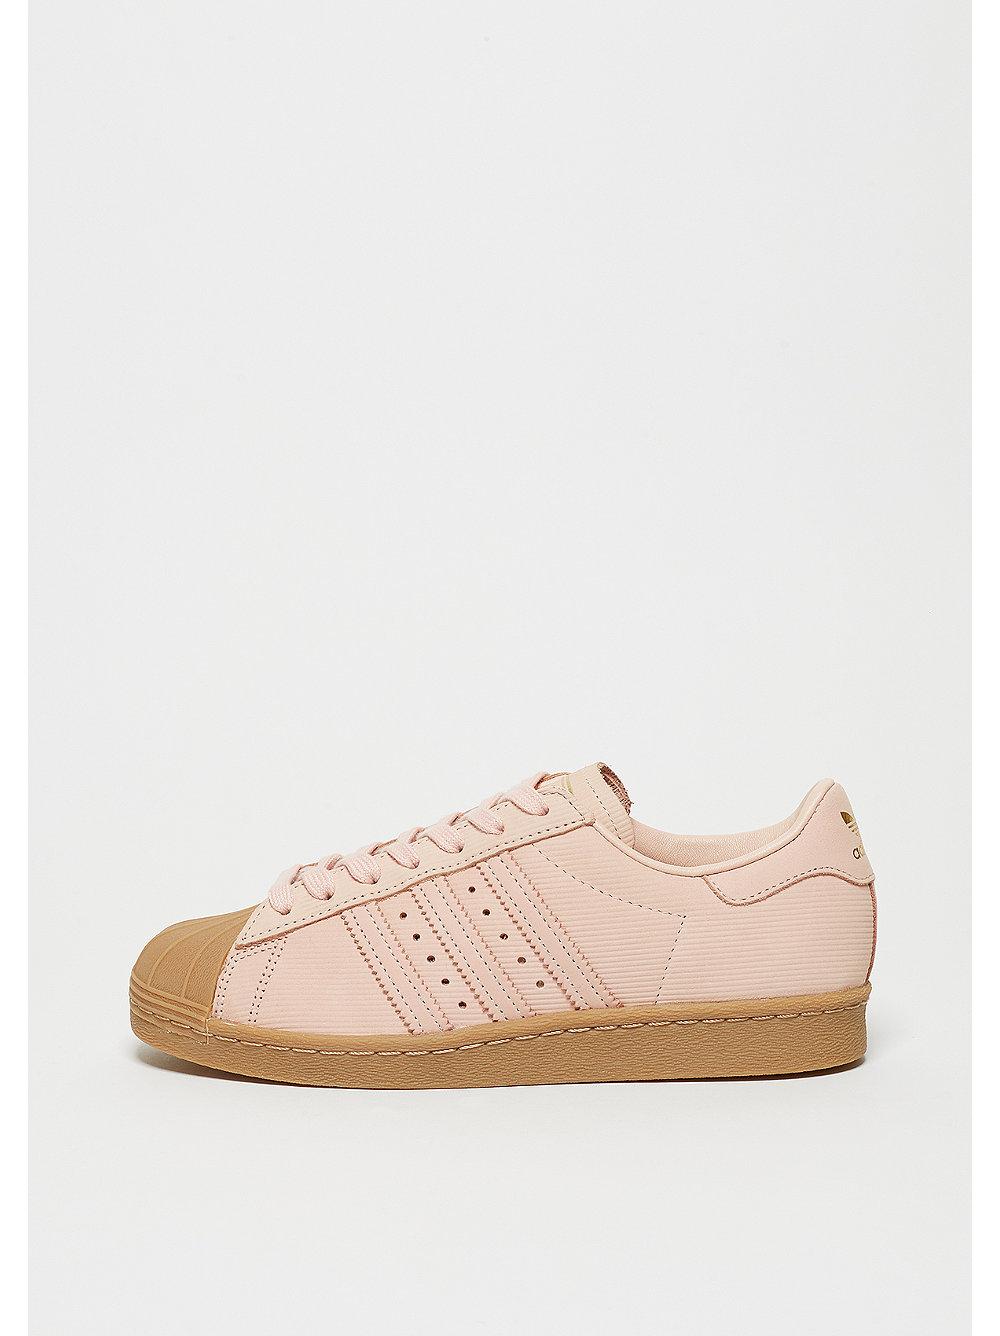 adidas Superstar 80s vapour pink-vapour pink-gum